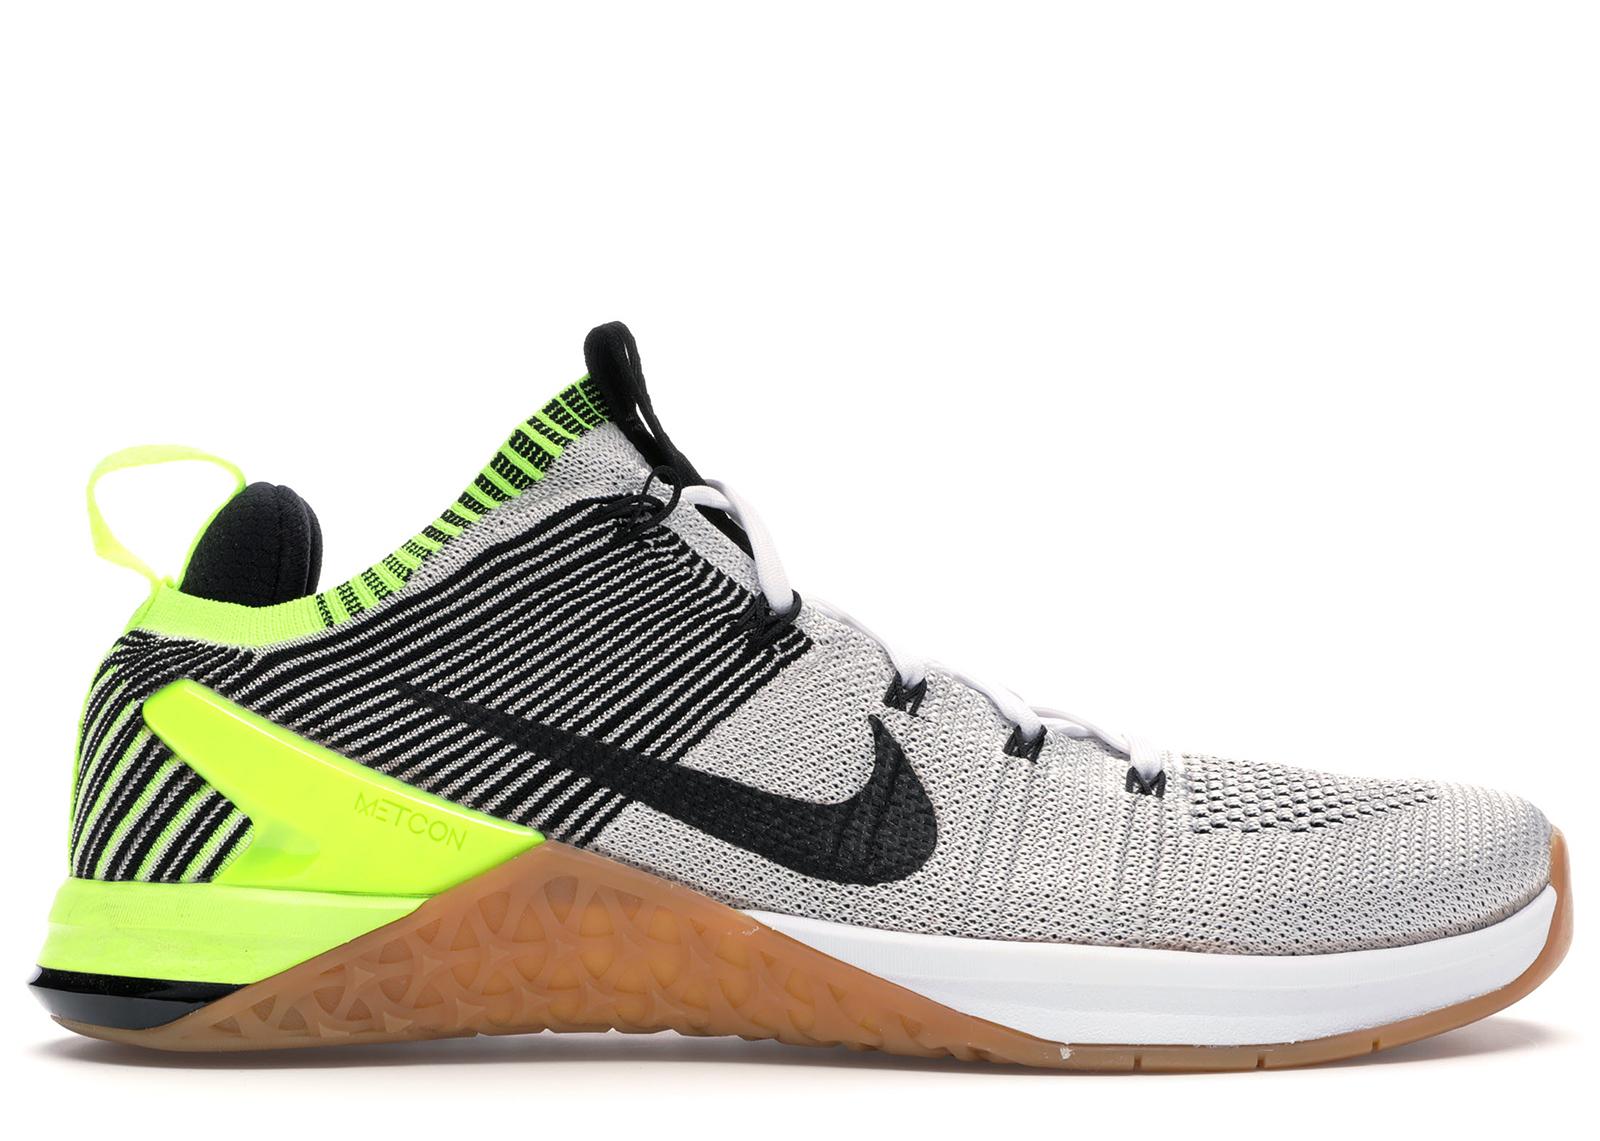 Nike Metcon DSX Flyknit 2 White Black